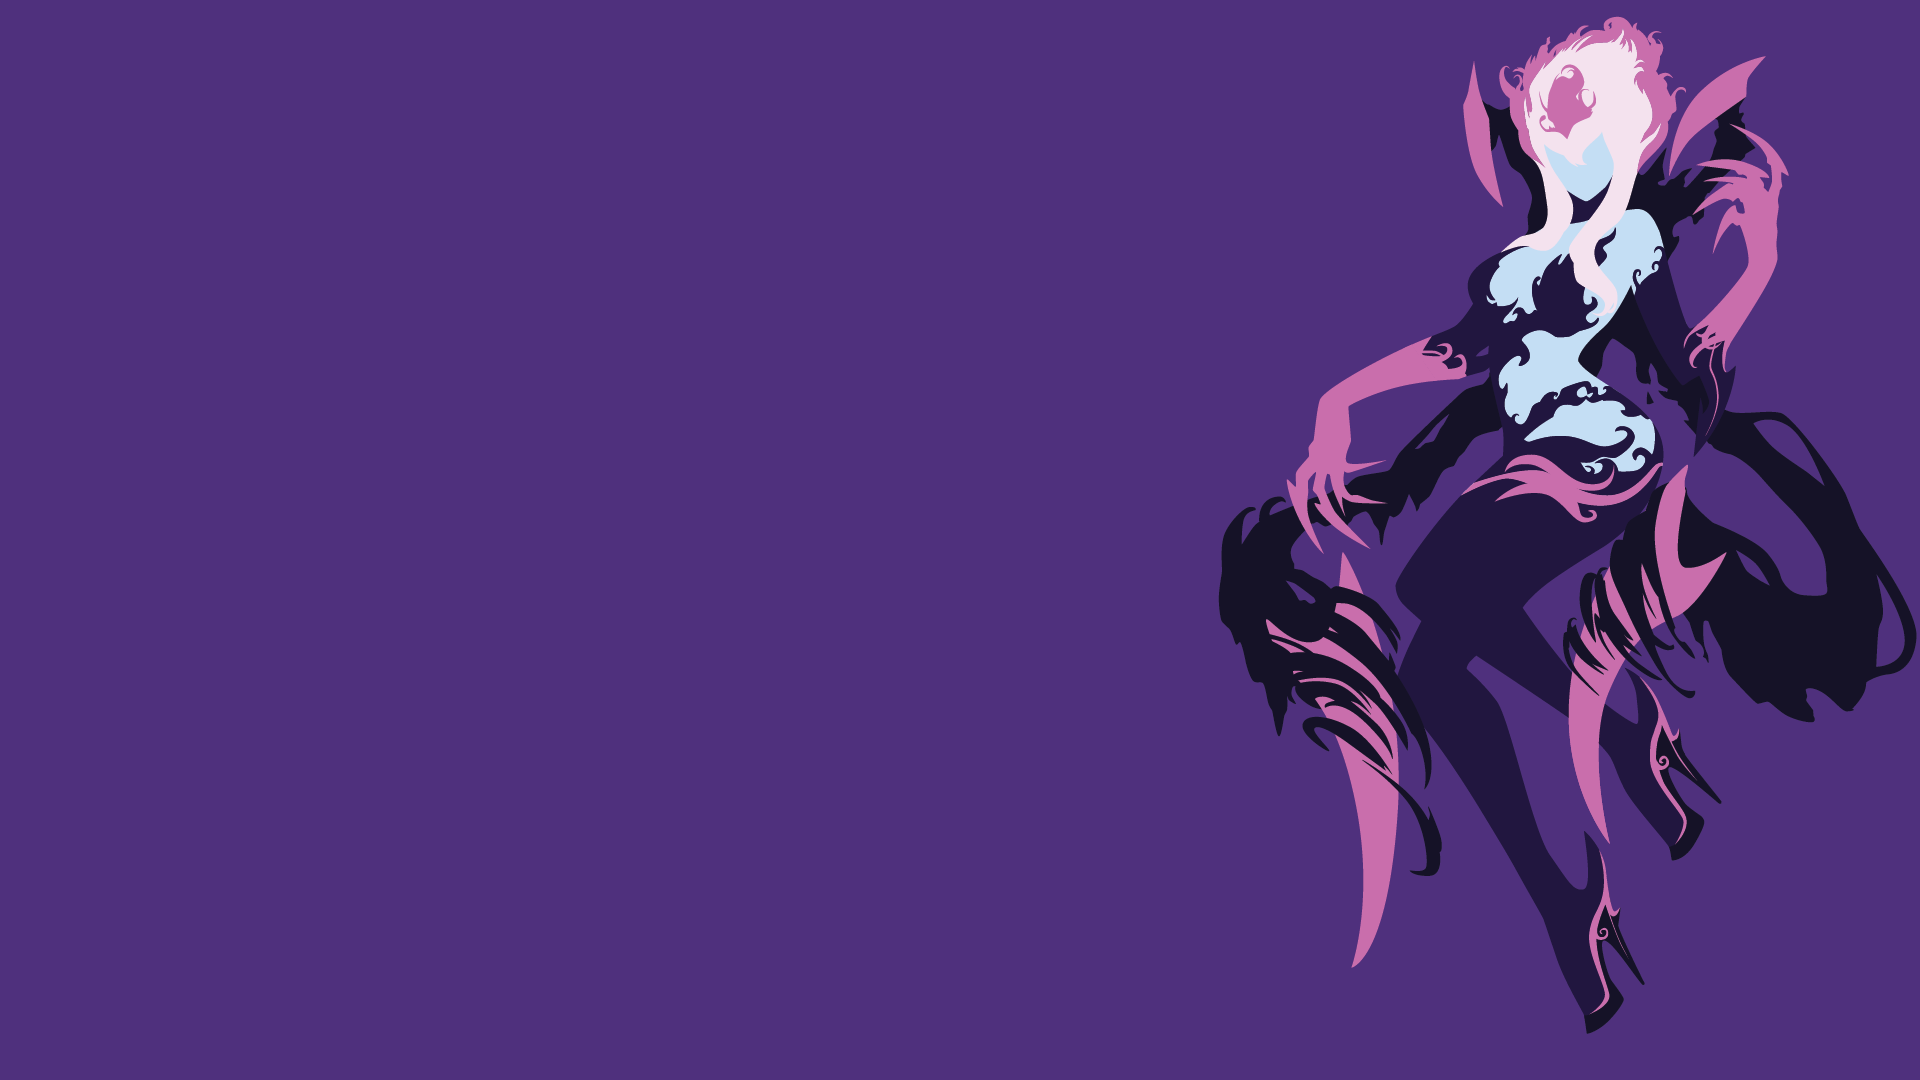 Minimalist League Of Legends Wallpapers Top Free Minimalist League Of Legends Backgrounds Wallpaperaccess